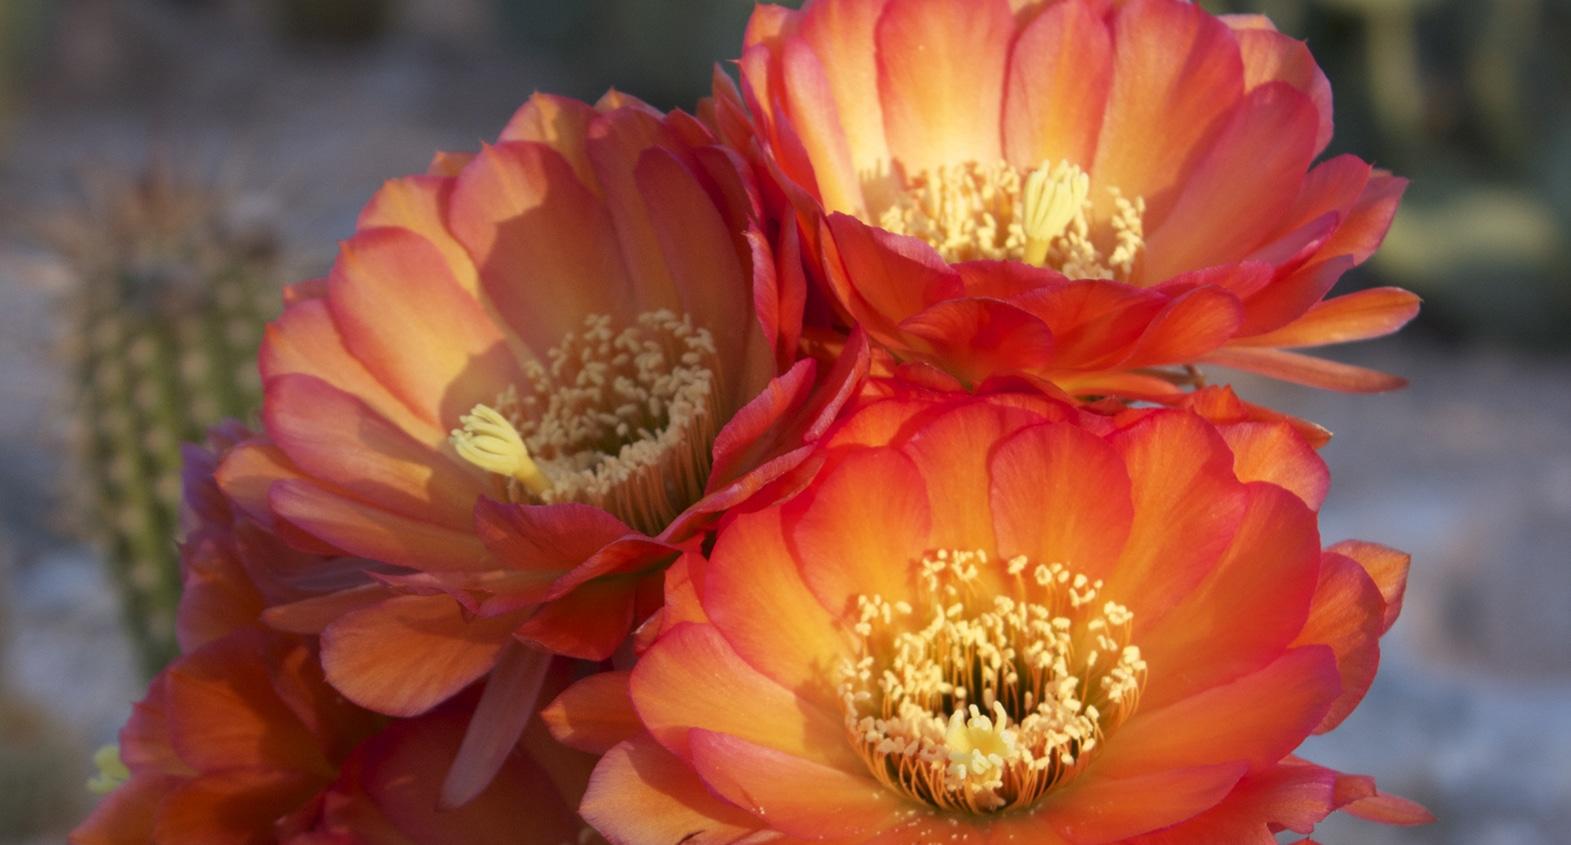 breast augmentation in Tucson